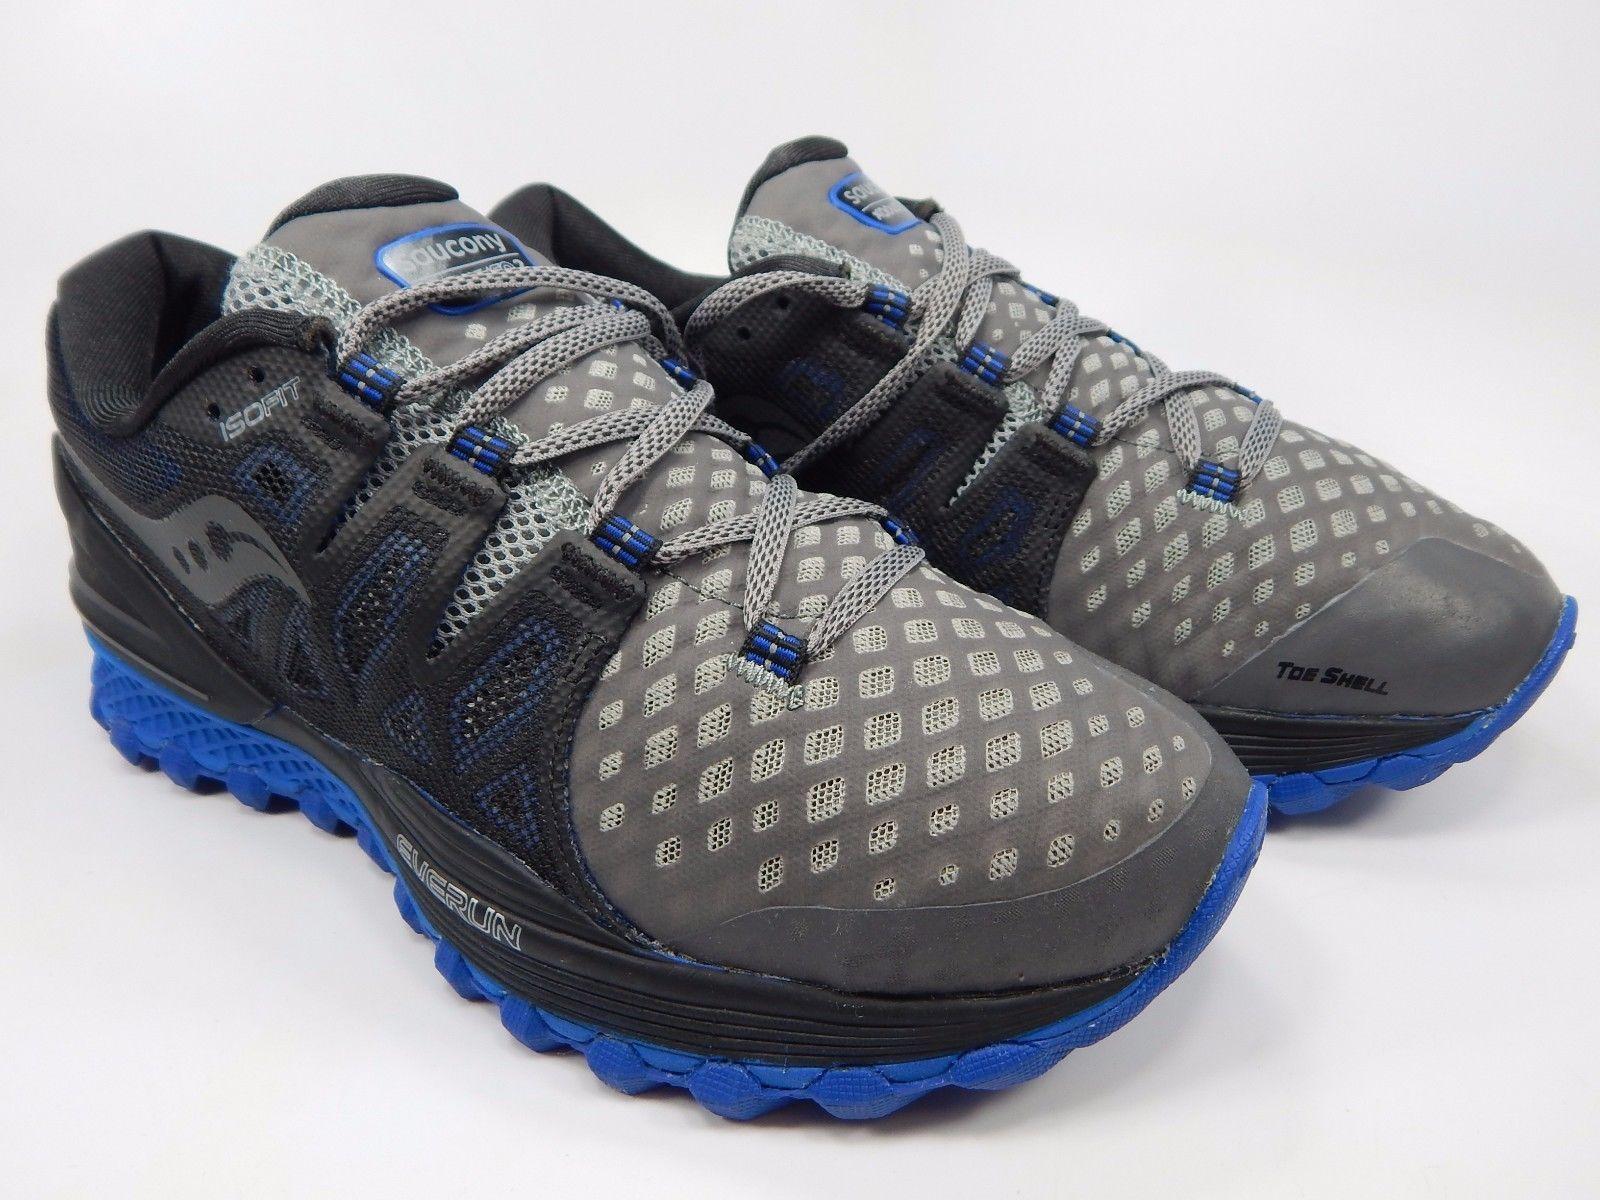 Saucony Xodus ISO 2 Men's Running Shoes Size US 9 M (D) EU 42.5 Gray S20387-2